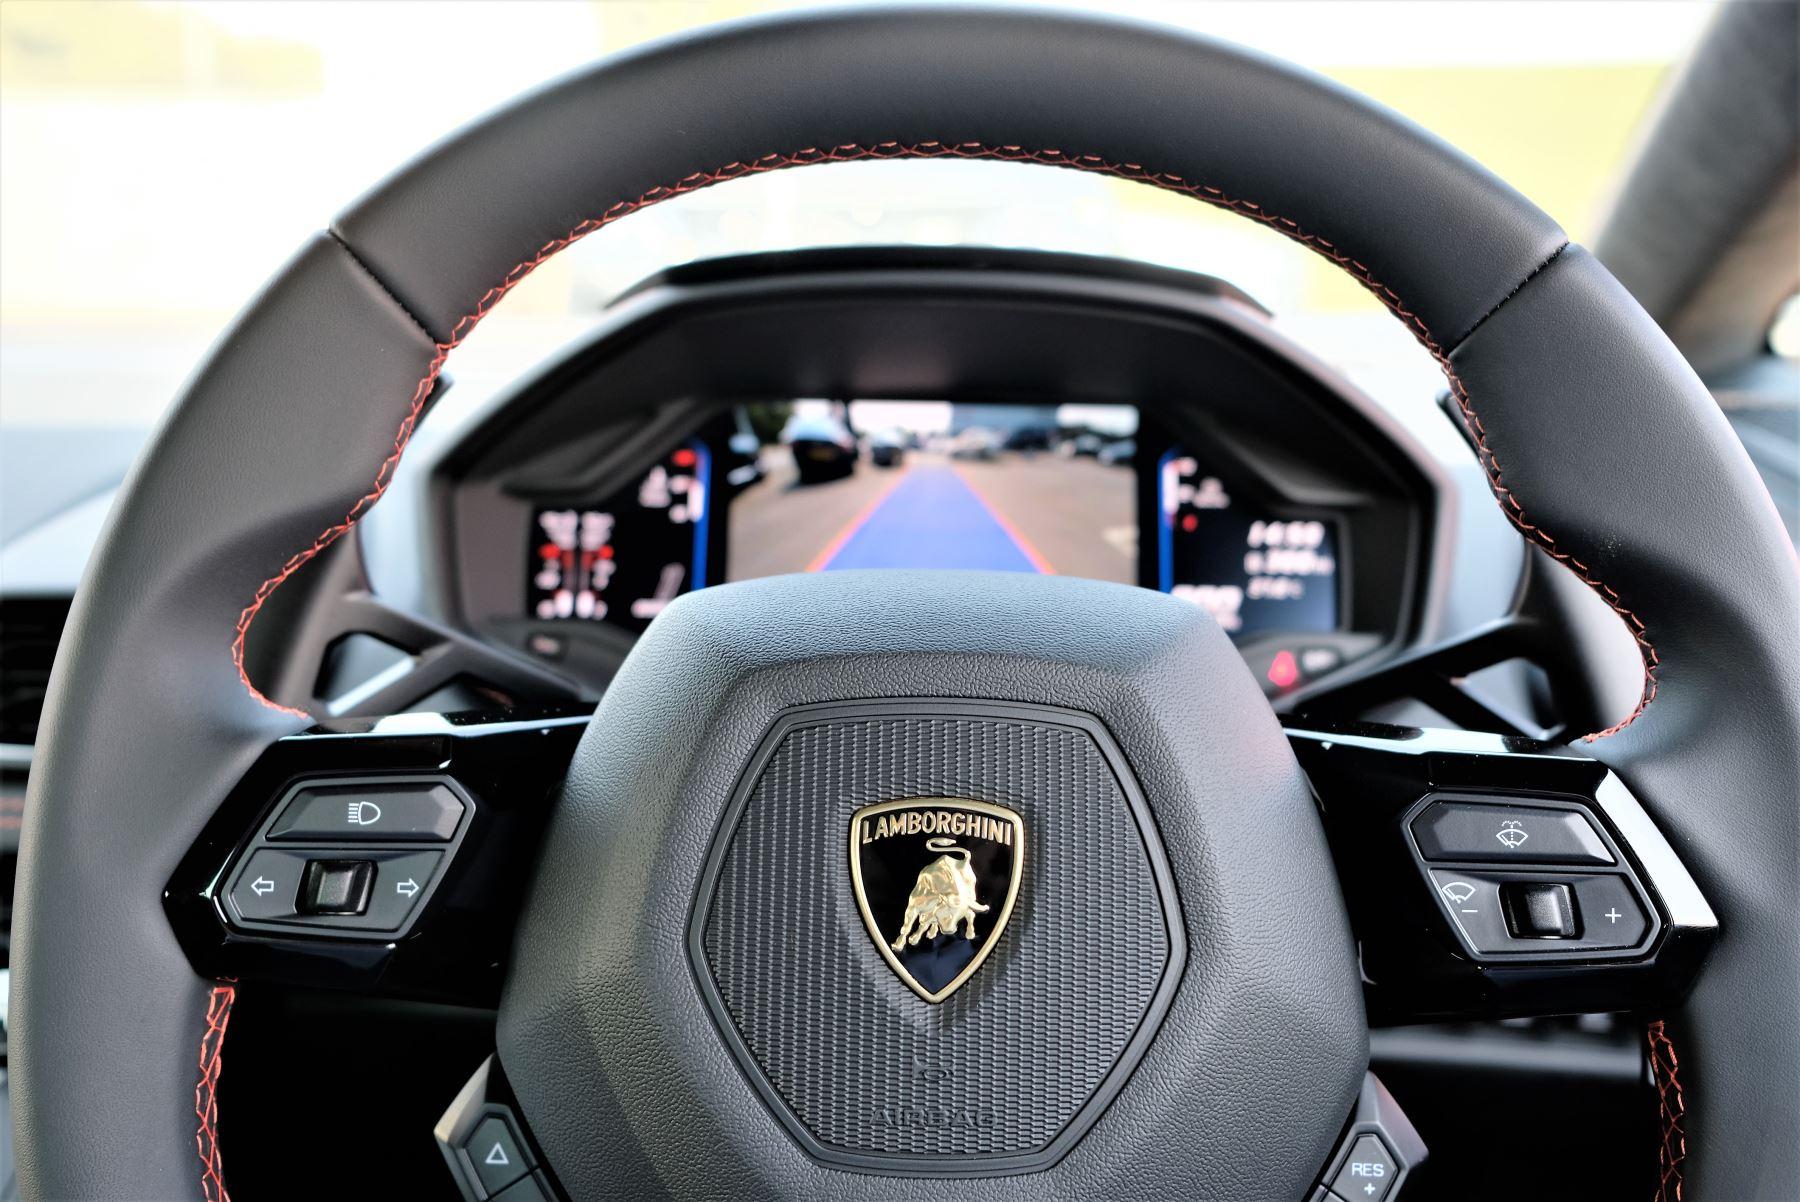 Lamborghini Huracan EVO LP 640-4 image 12